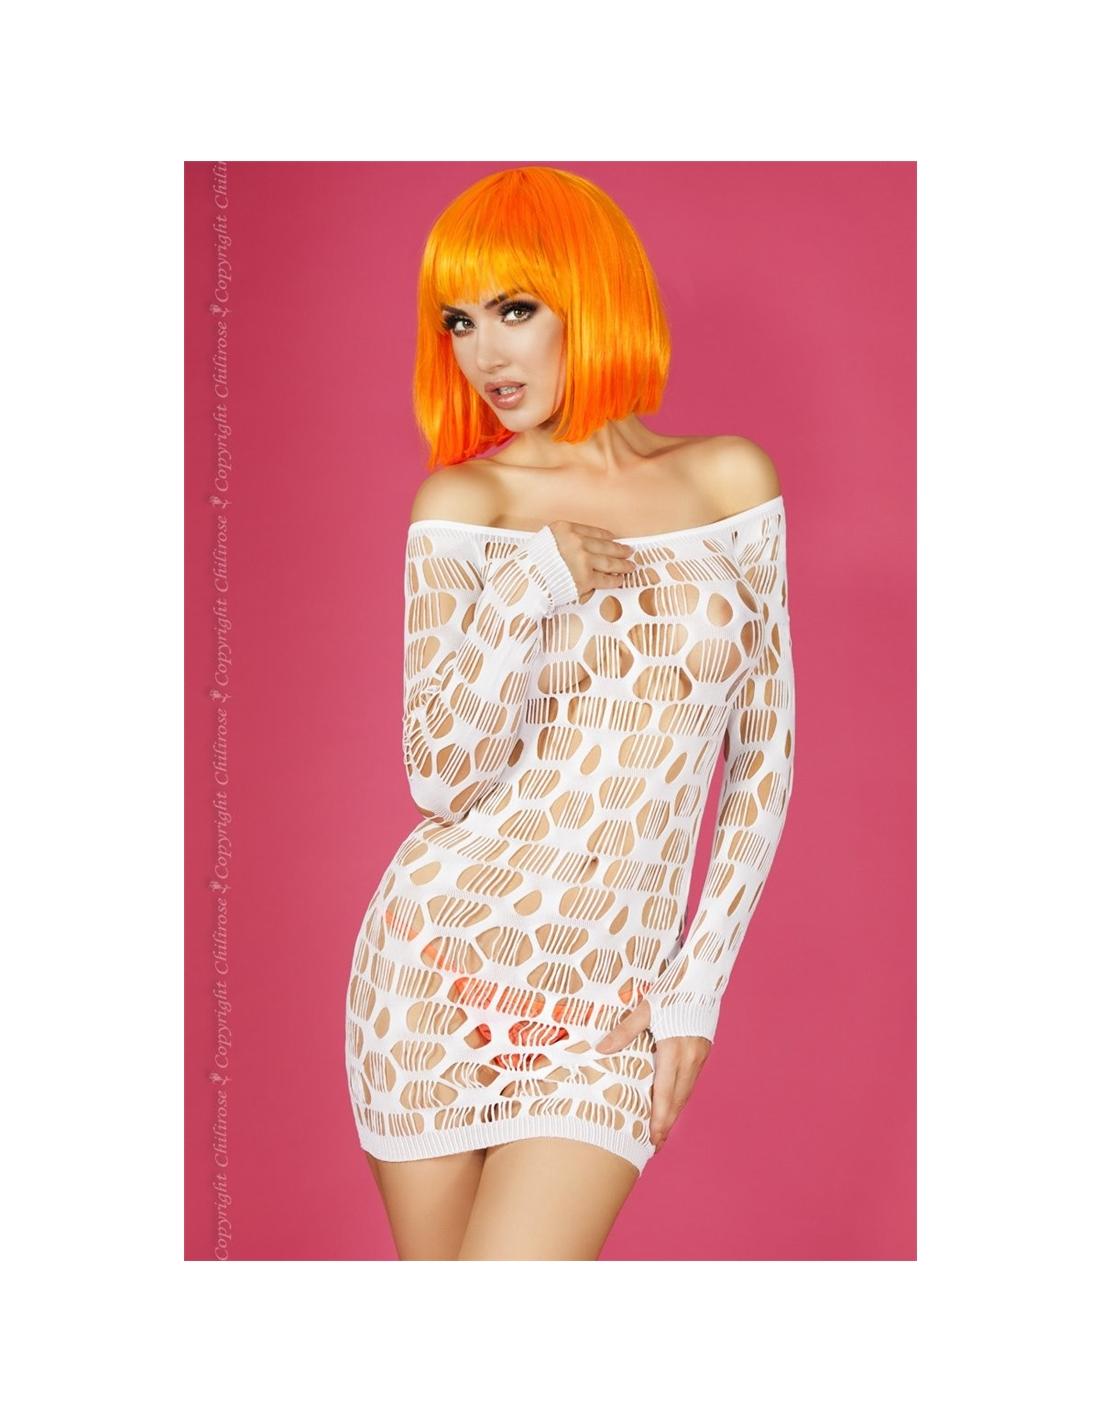 Vestido Cr-3380 Branco - 36-38 S/M - PR2010323633